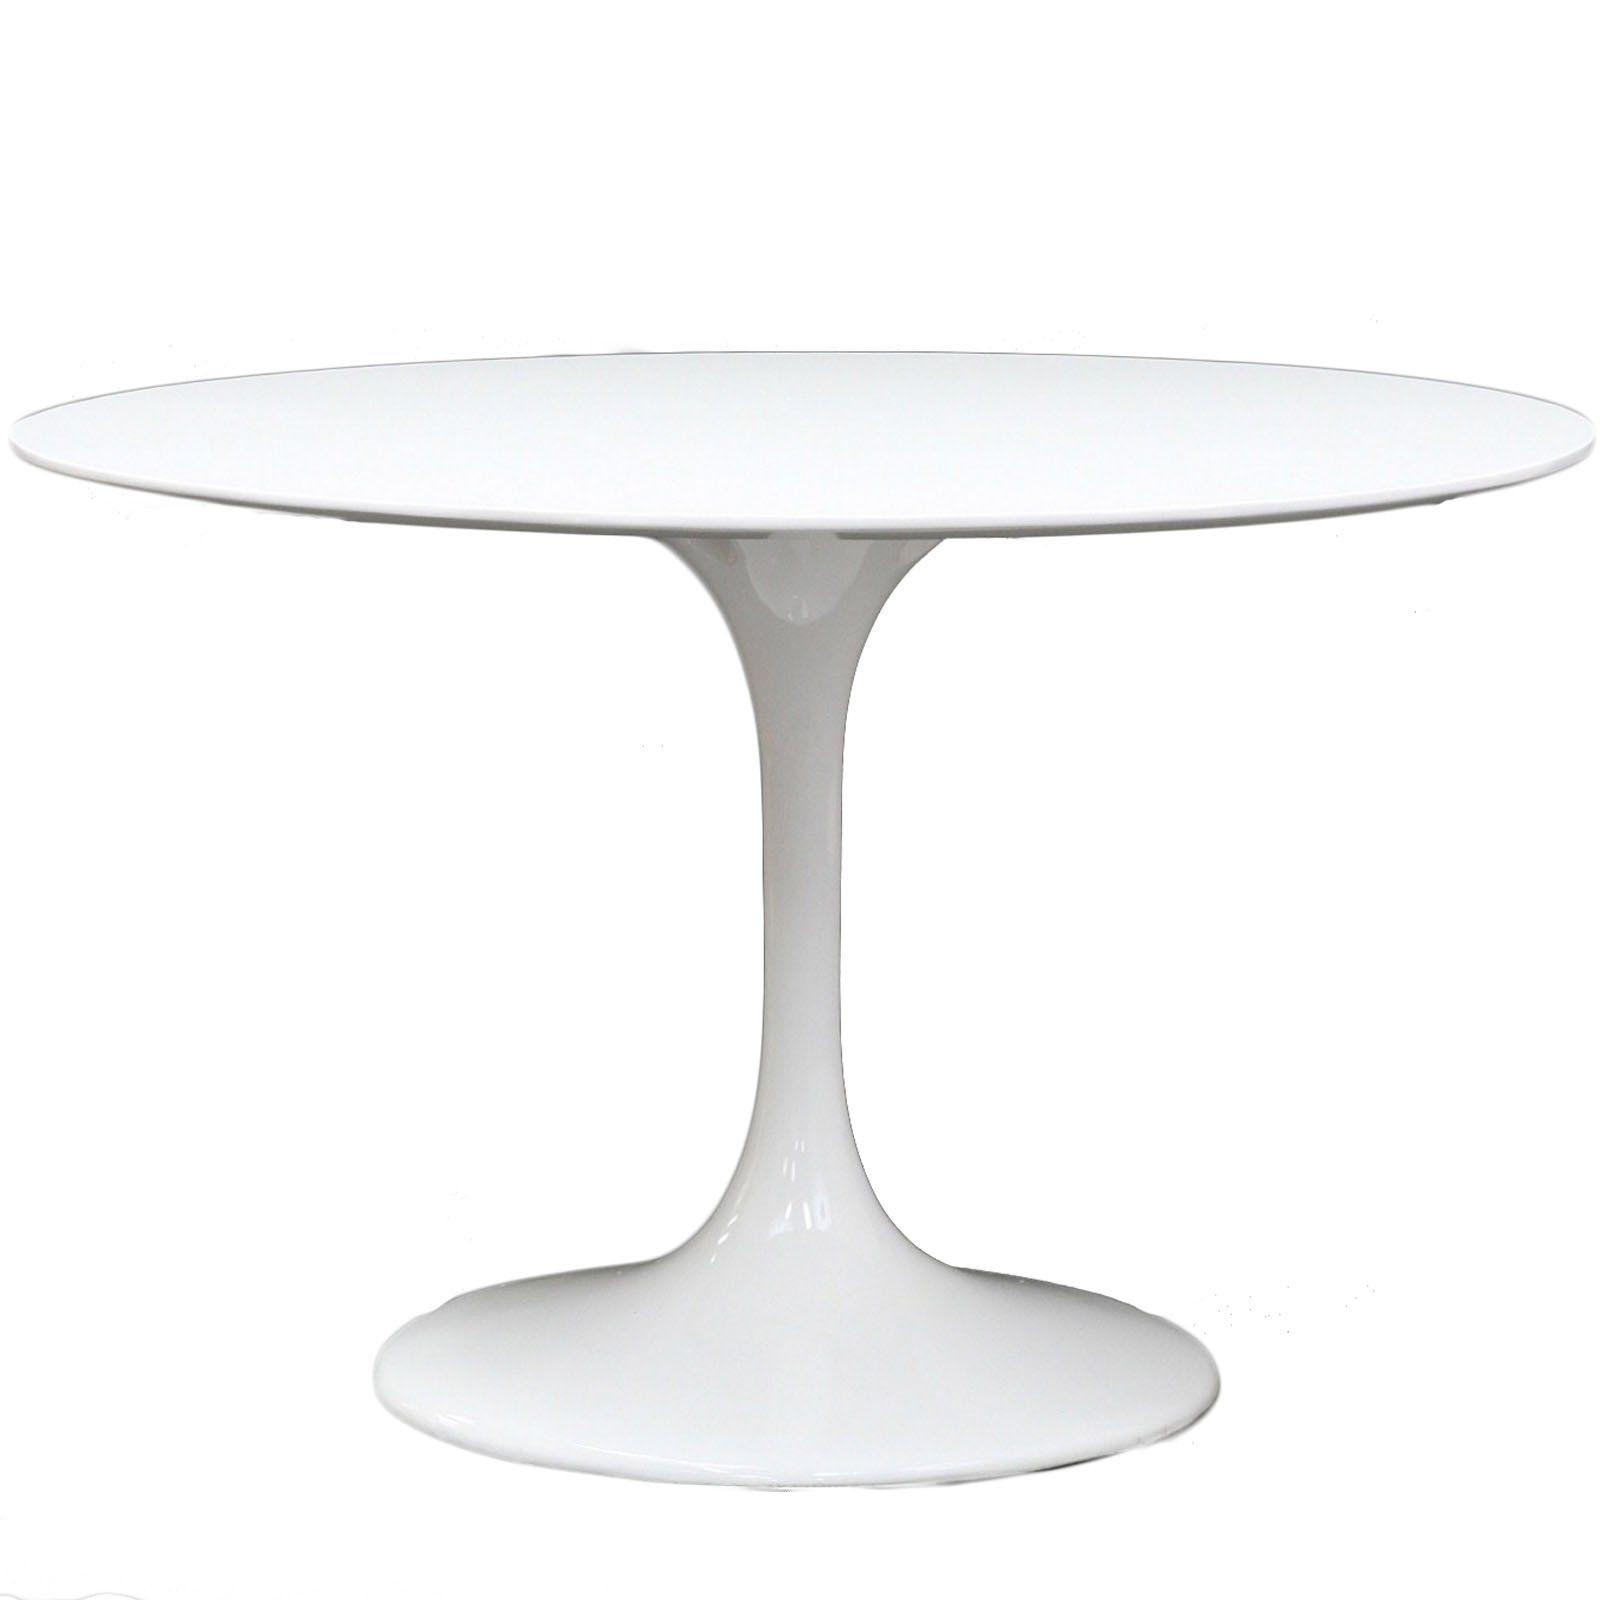 Modway Furniture Lippa 40 Fiberglass Dining Table Tulip Dining Table Dining Table